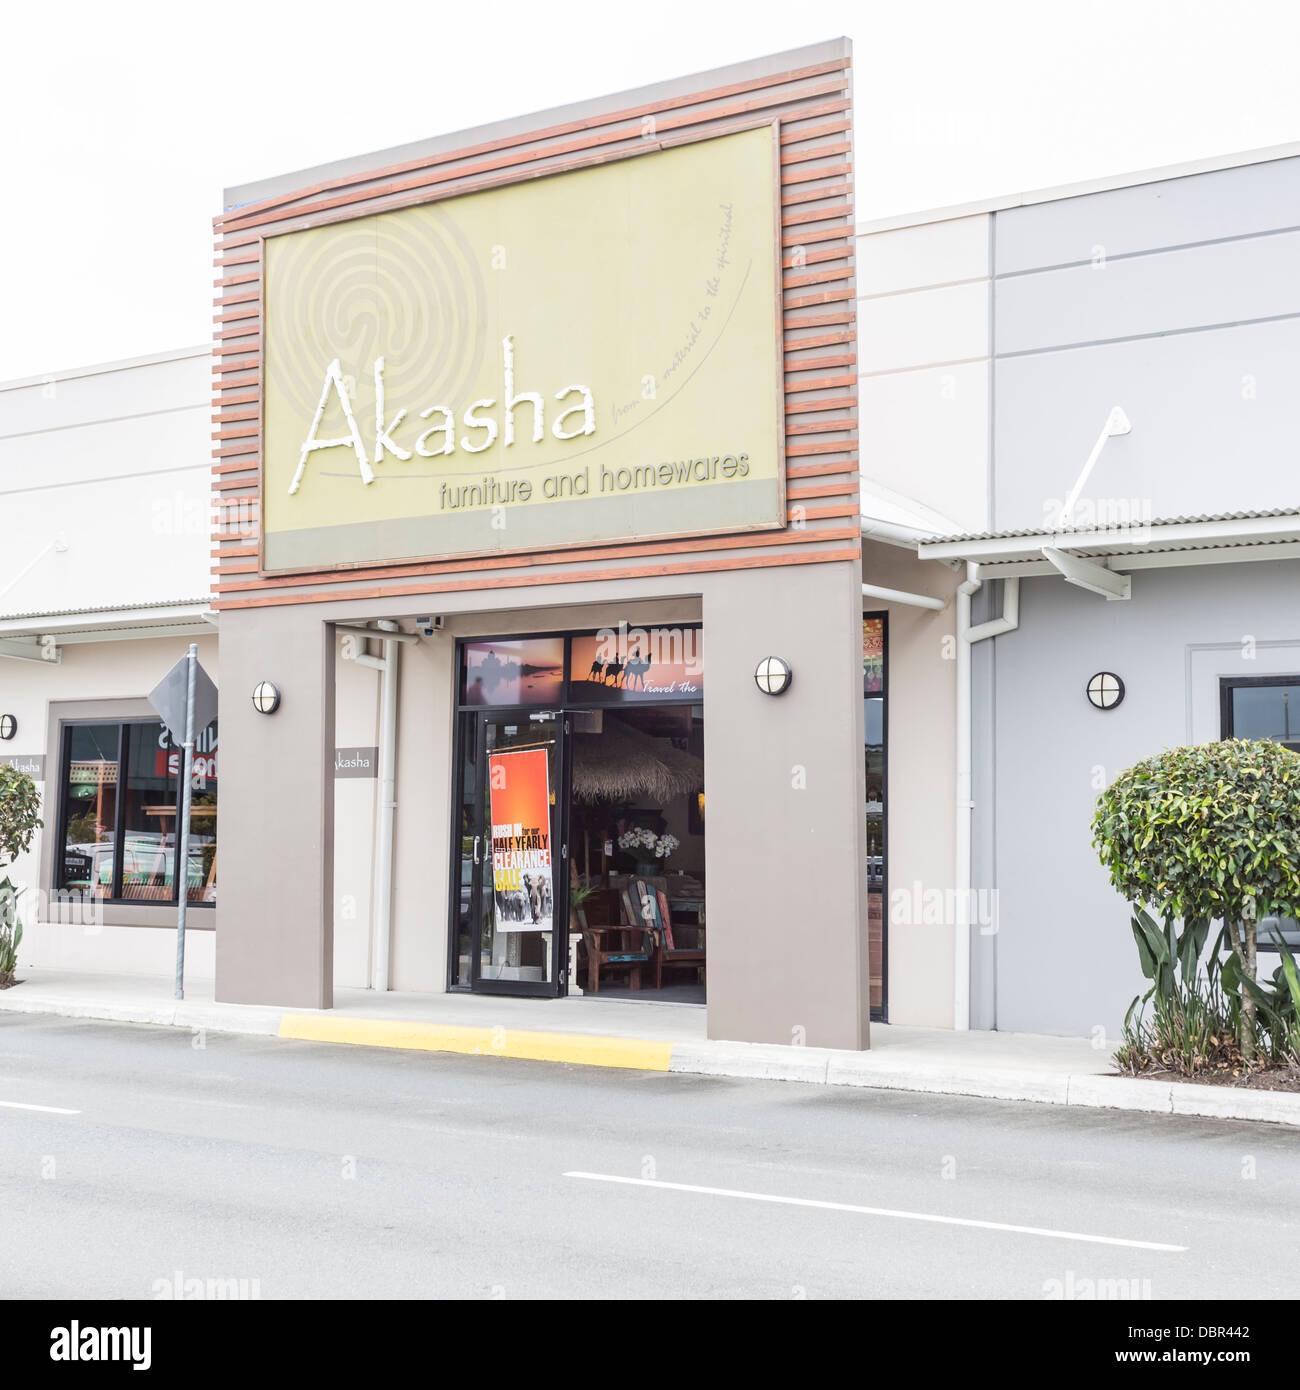 Akasha furniture and homewares store at modern shopping precinct at maroochydore on sunshine coast queensland australia